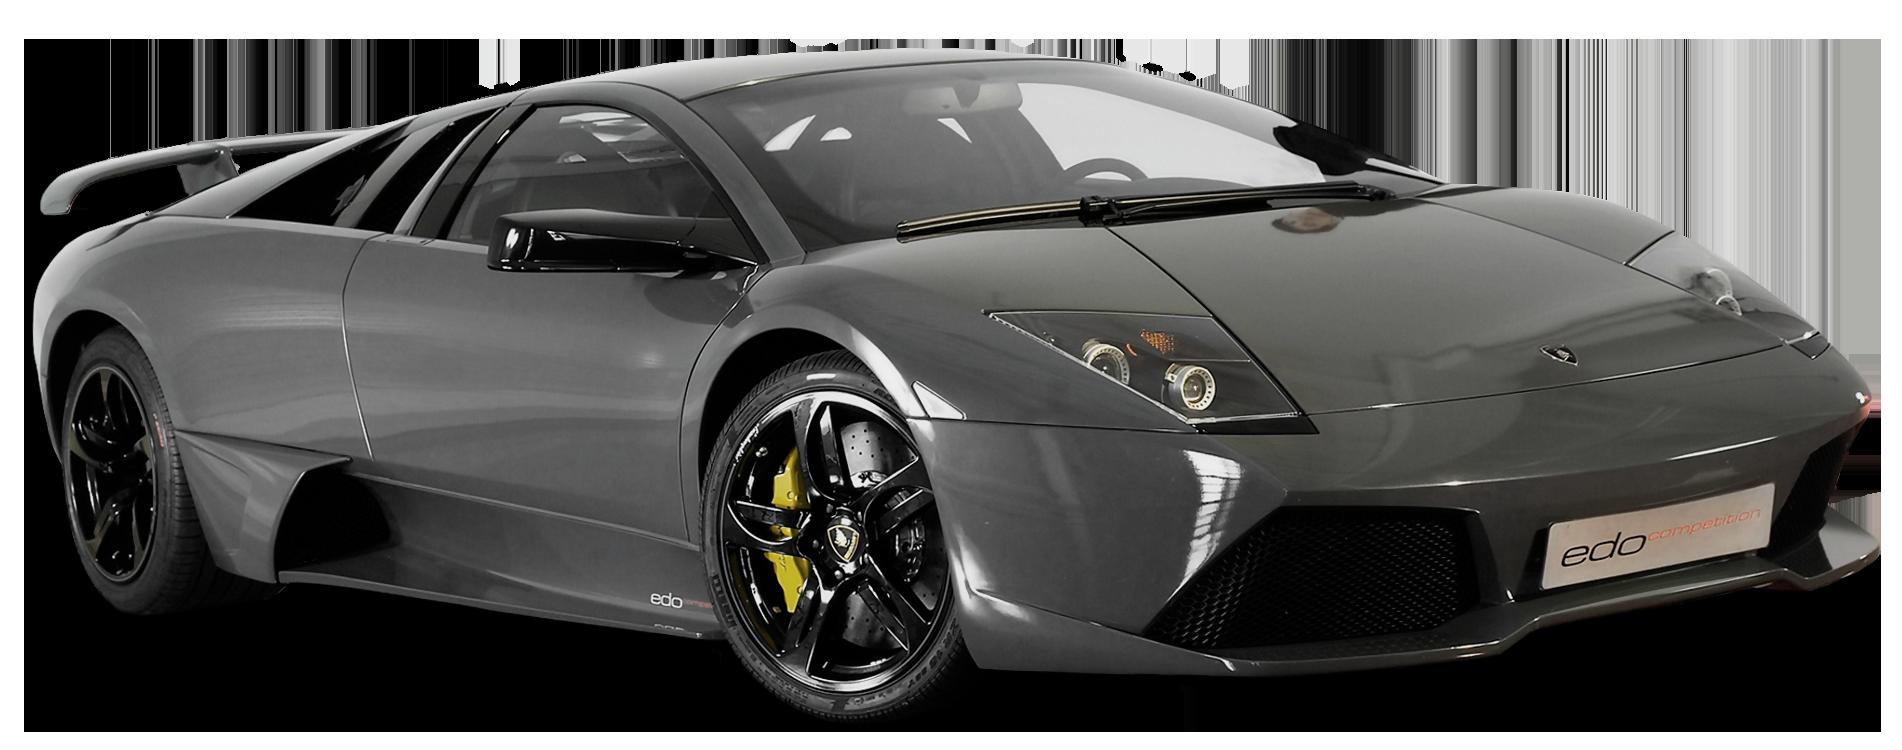 Ferrari clipart lamborghini WEB Best Edo Competiton Lamborghini